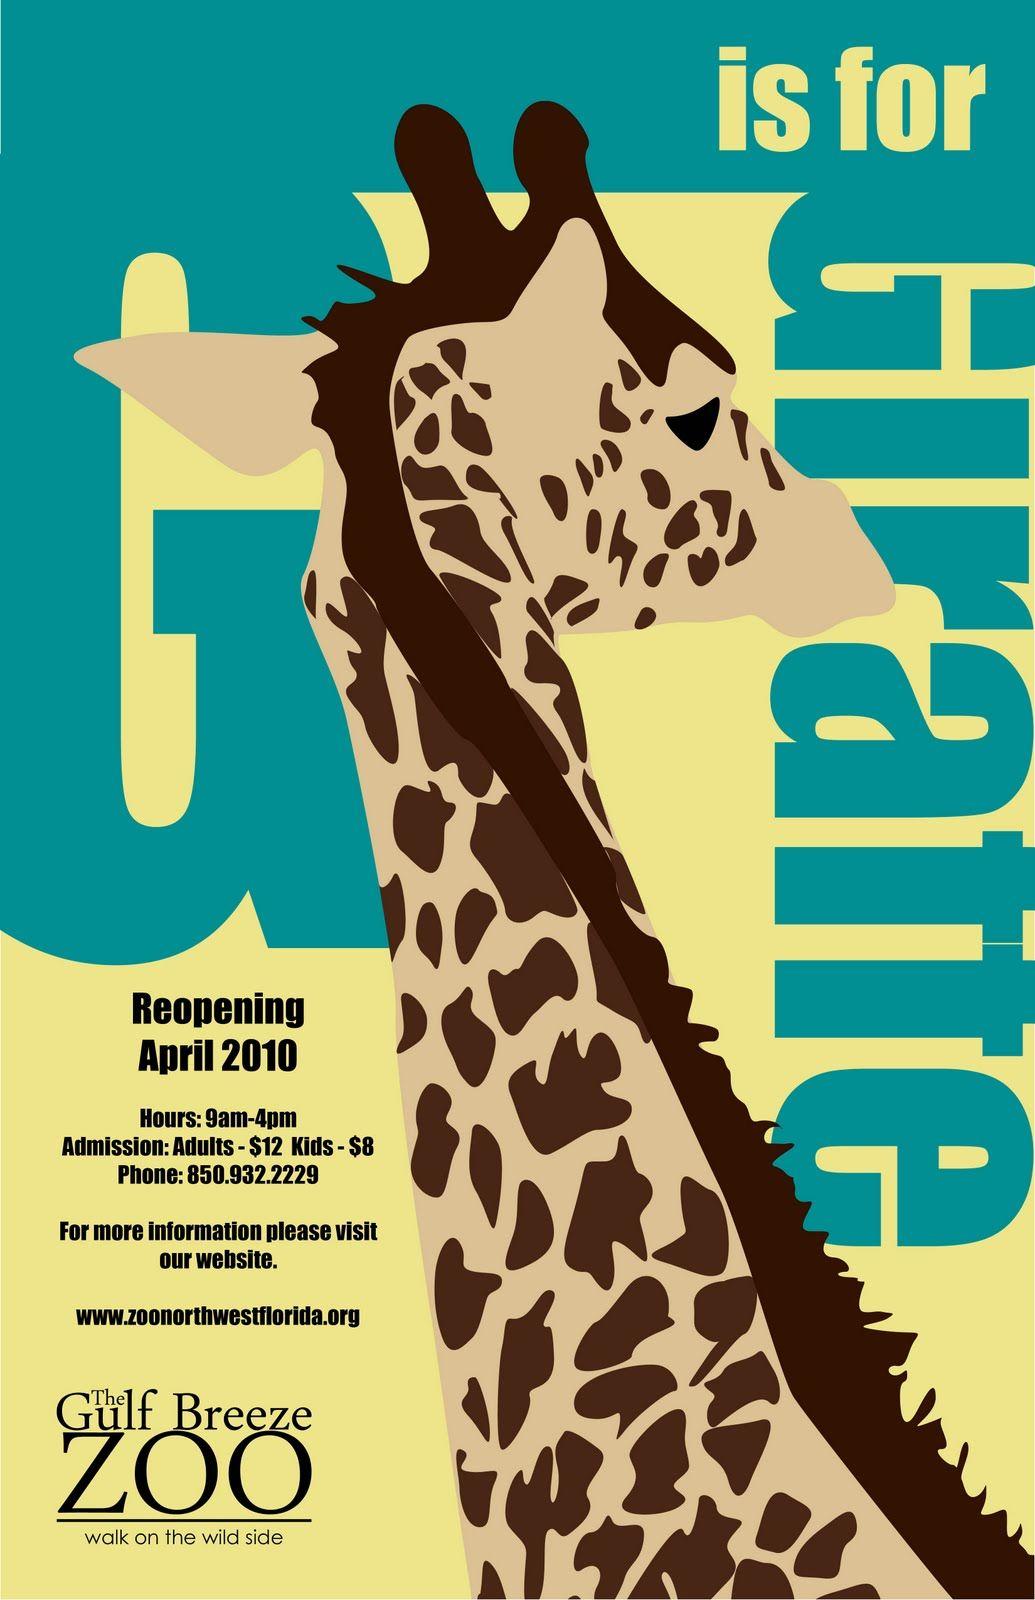 Zoo poster design - Http 3 Bp Blogspot Com _cjio5ihjz6o S7ptegklnvi Design Postersvintage